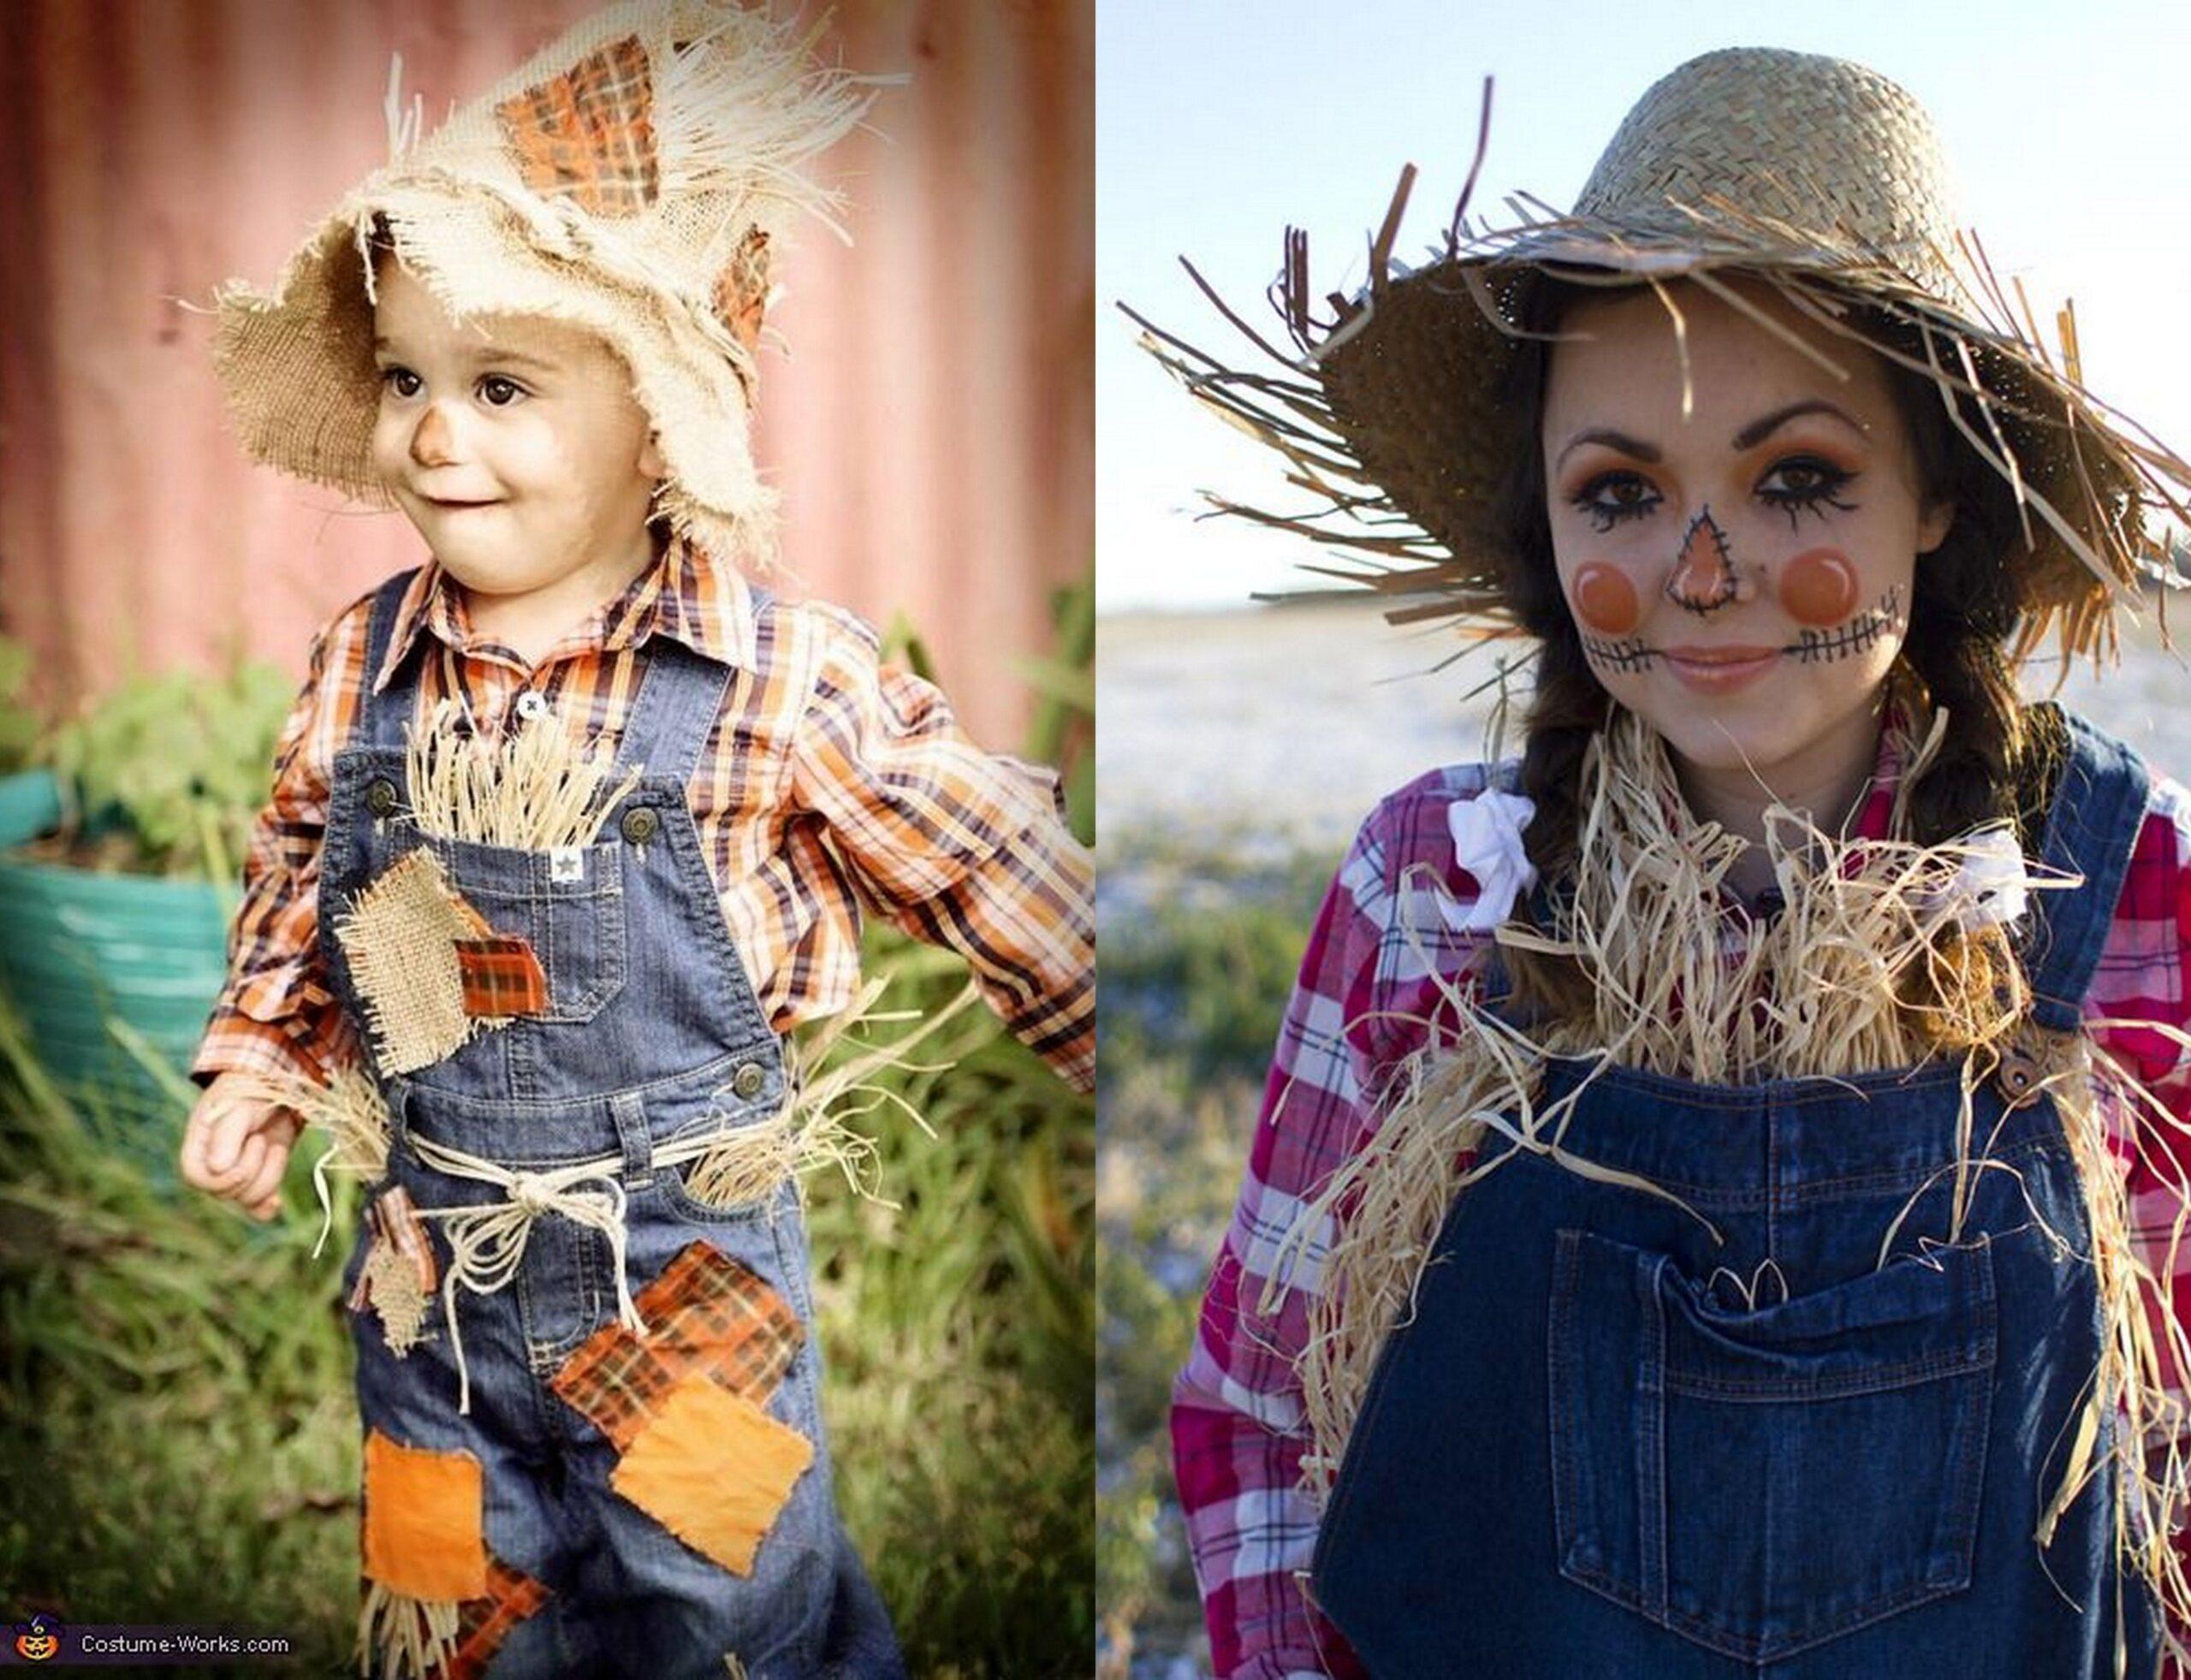 6 semplici travestimenti last minute per Halloween!